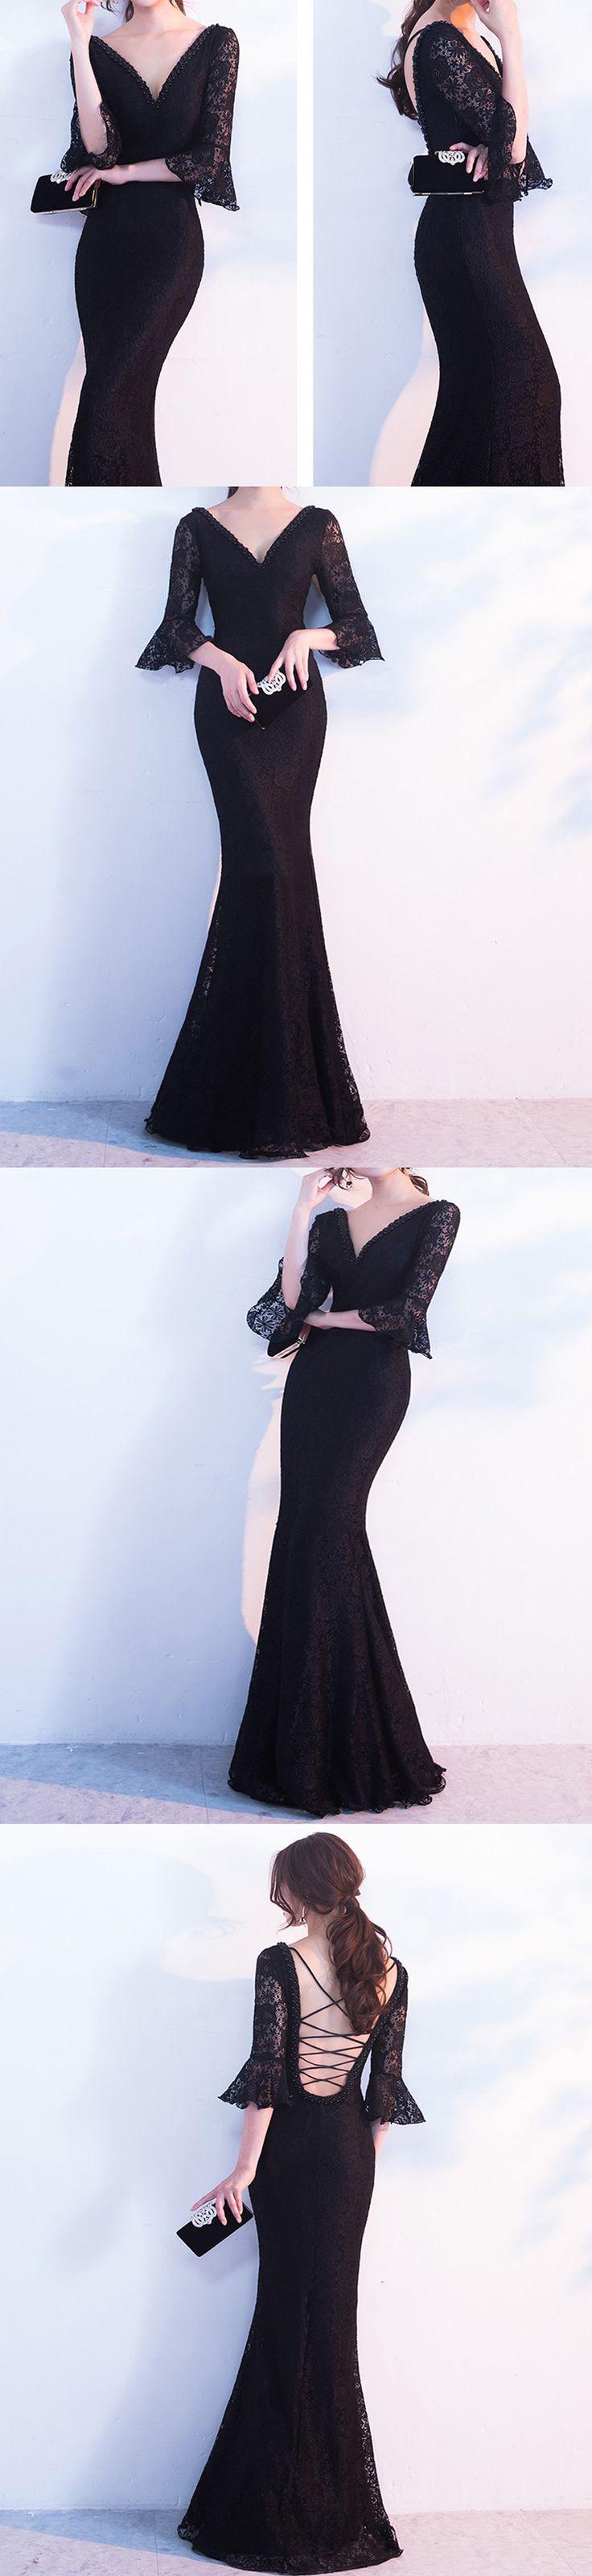 Elegant black lace prom dress,Popular half speaker sleeve prom dress,Sexy mermaid lace up back prom dresses, PD21004